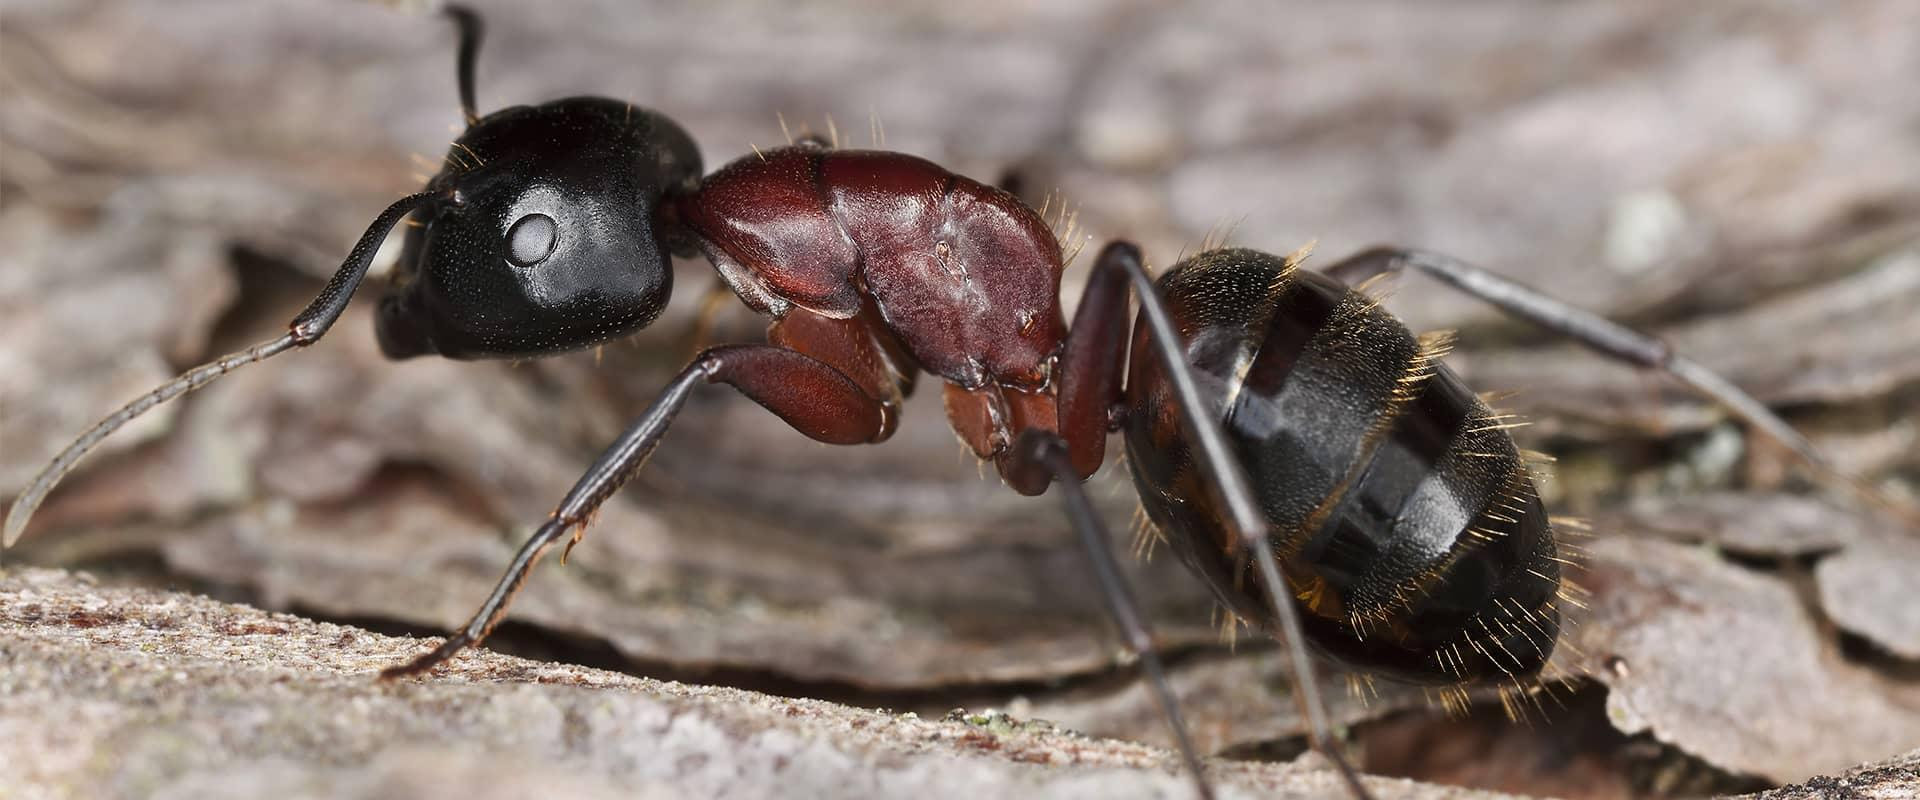 argentine ants up close